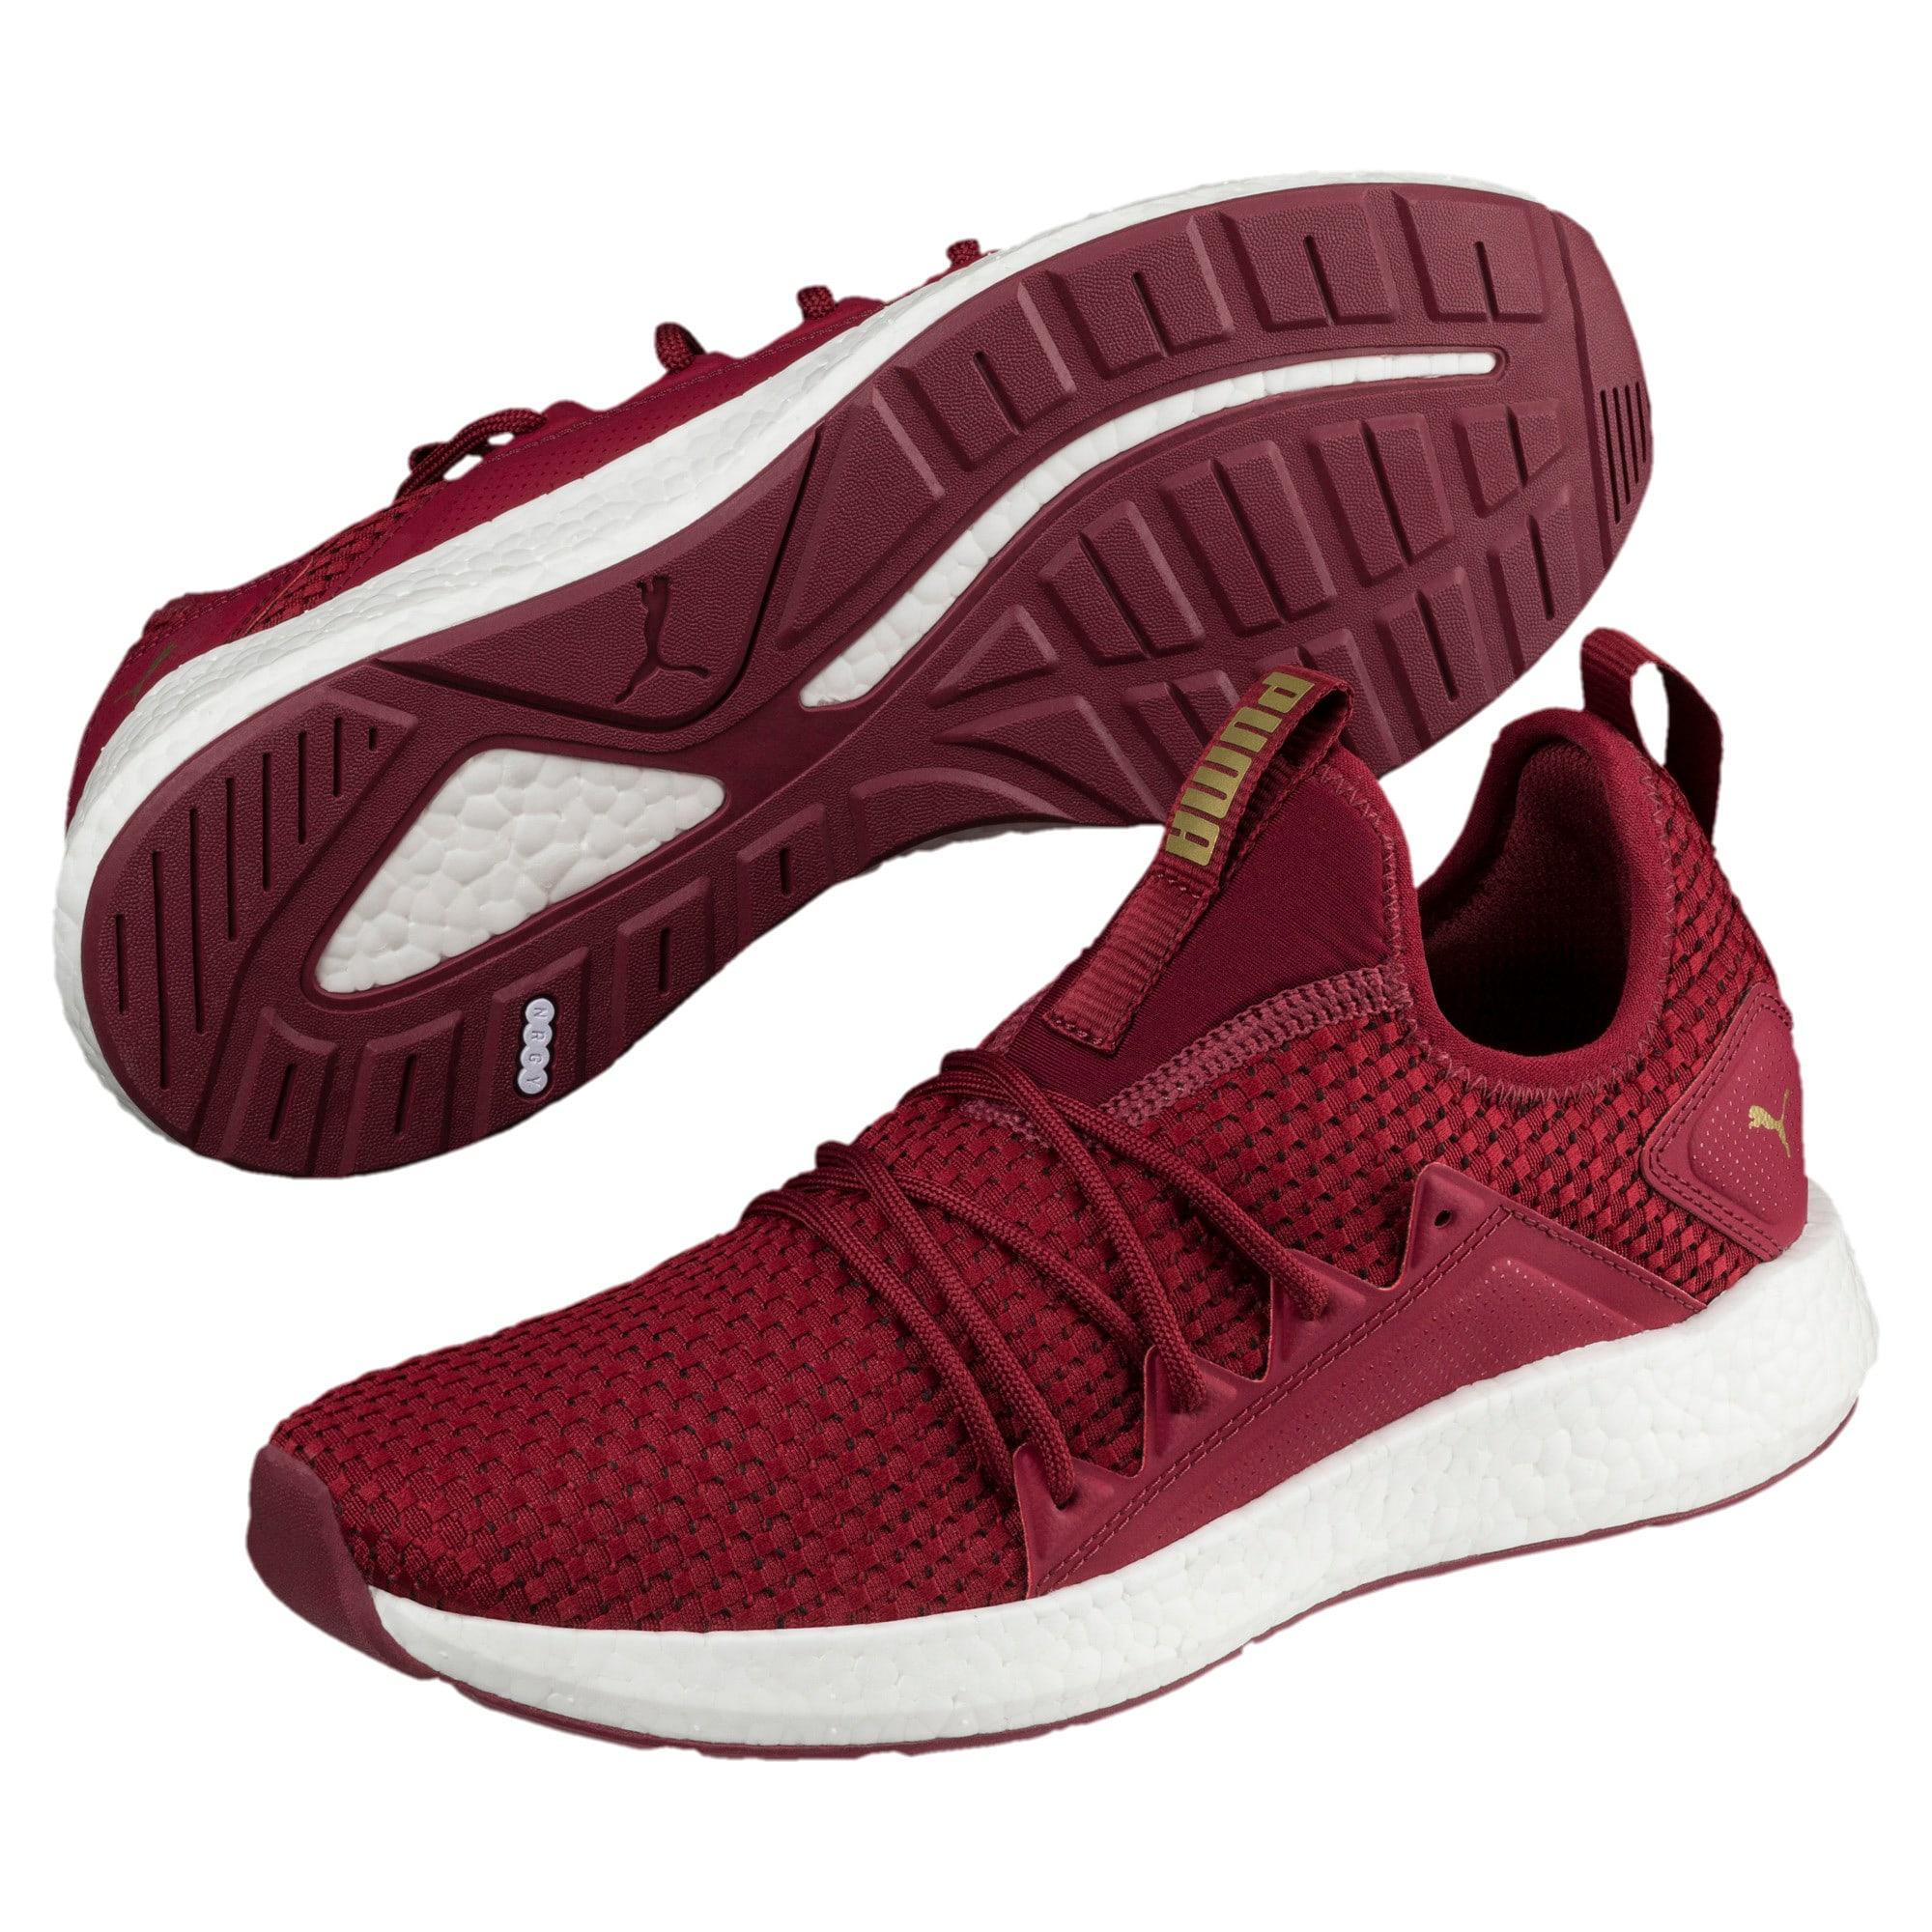 Thumbnail 2 of NRGY Neko VT Women's Running Shoes, Pomegranate-Metallic Gold, medium